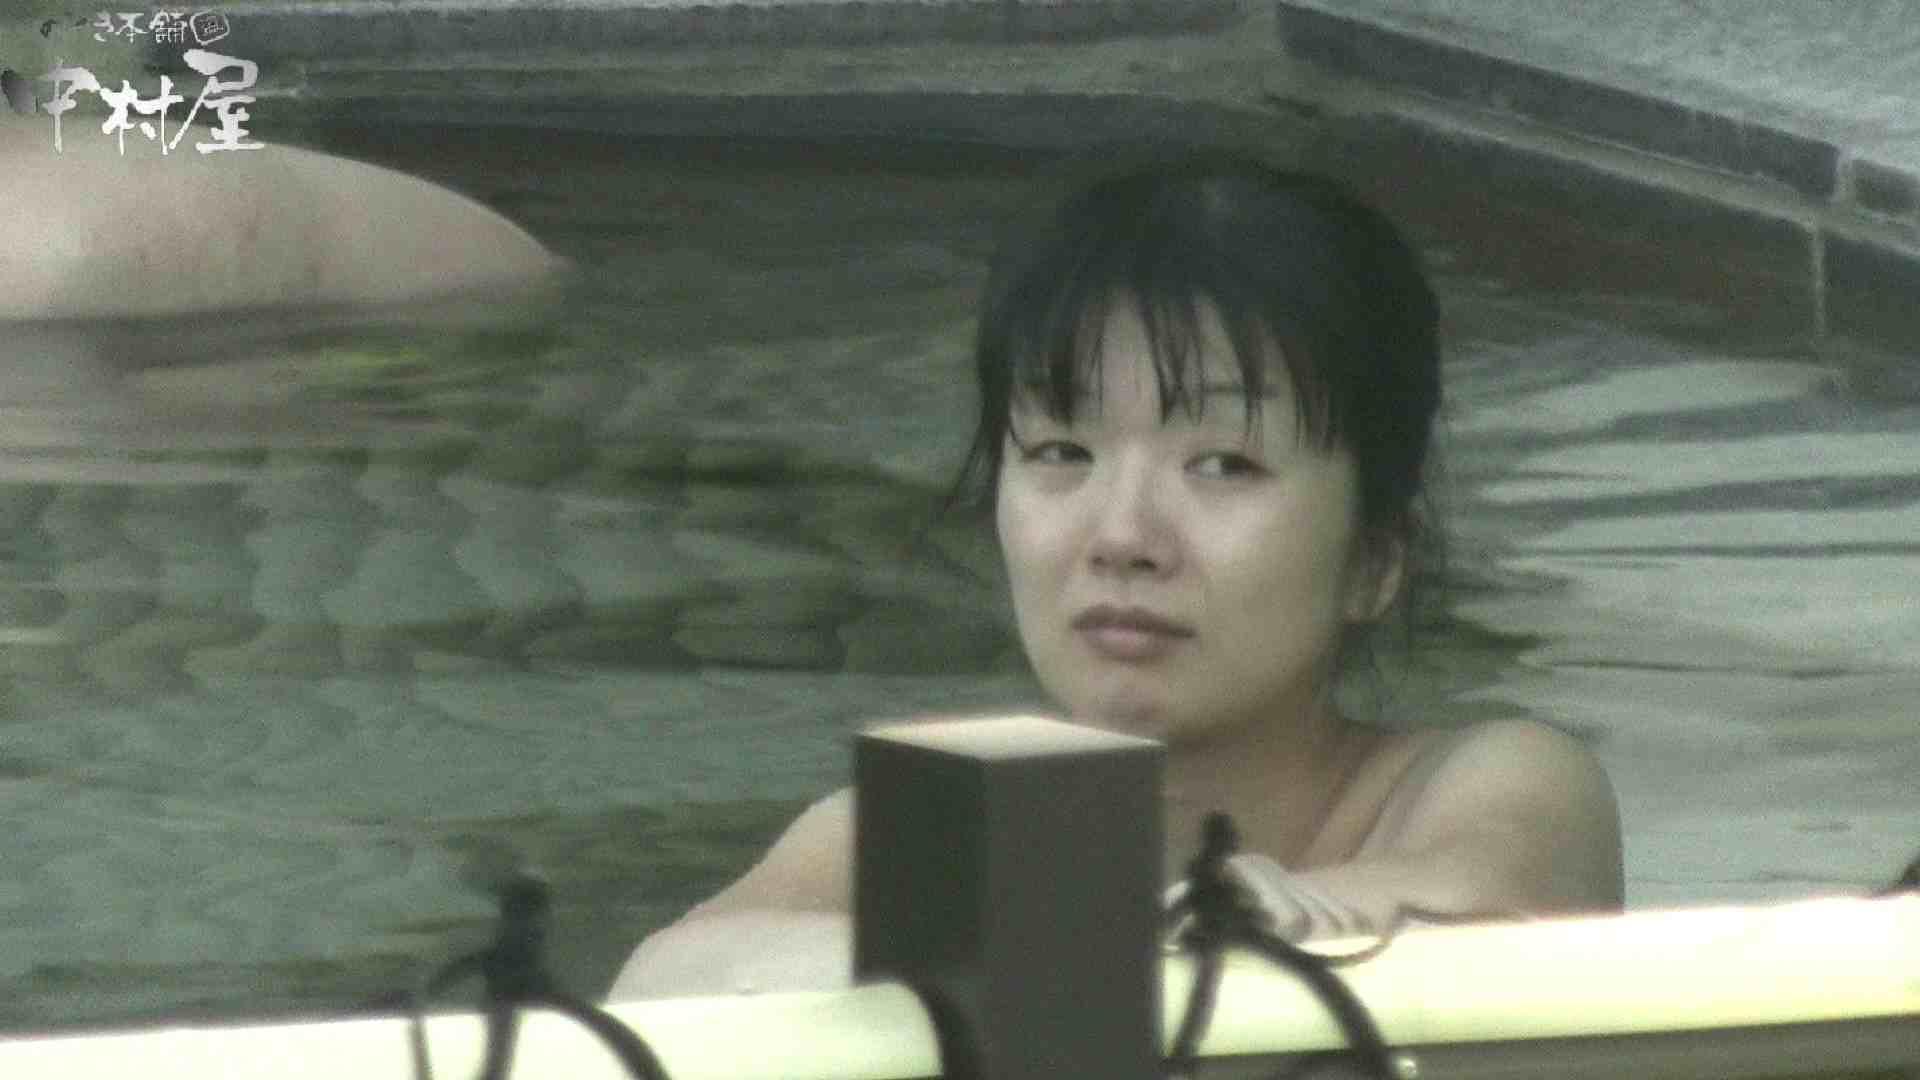 Aquaな露天風呂Vol.904 美しいOLの裸体 オメコ動画キャプチャ 103pic 47